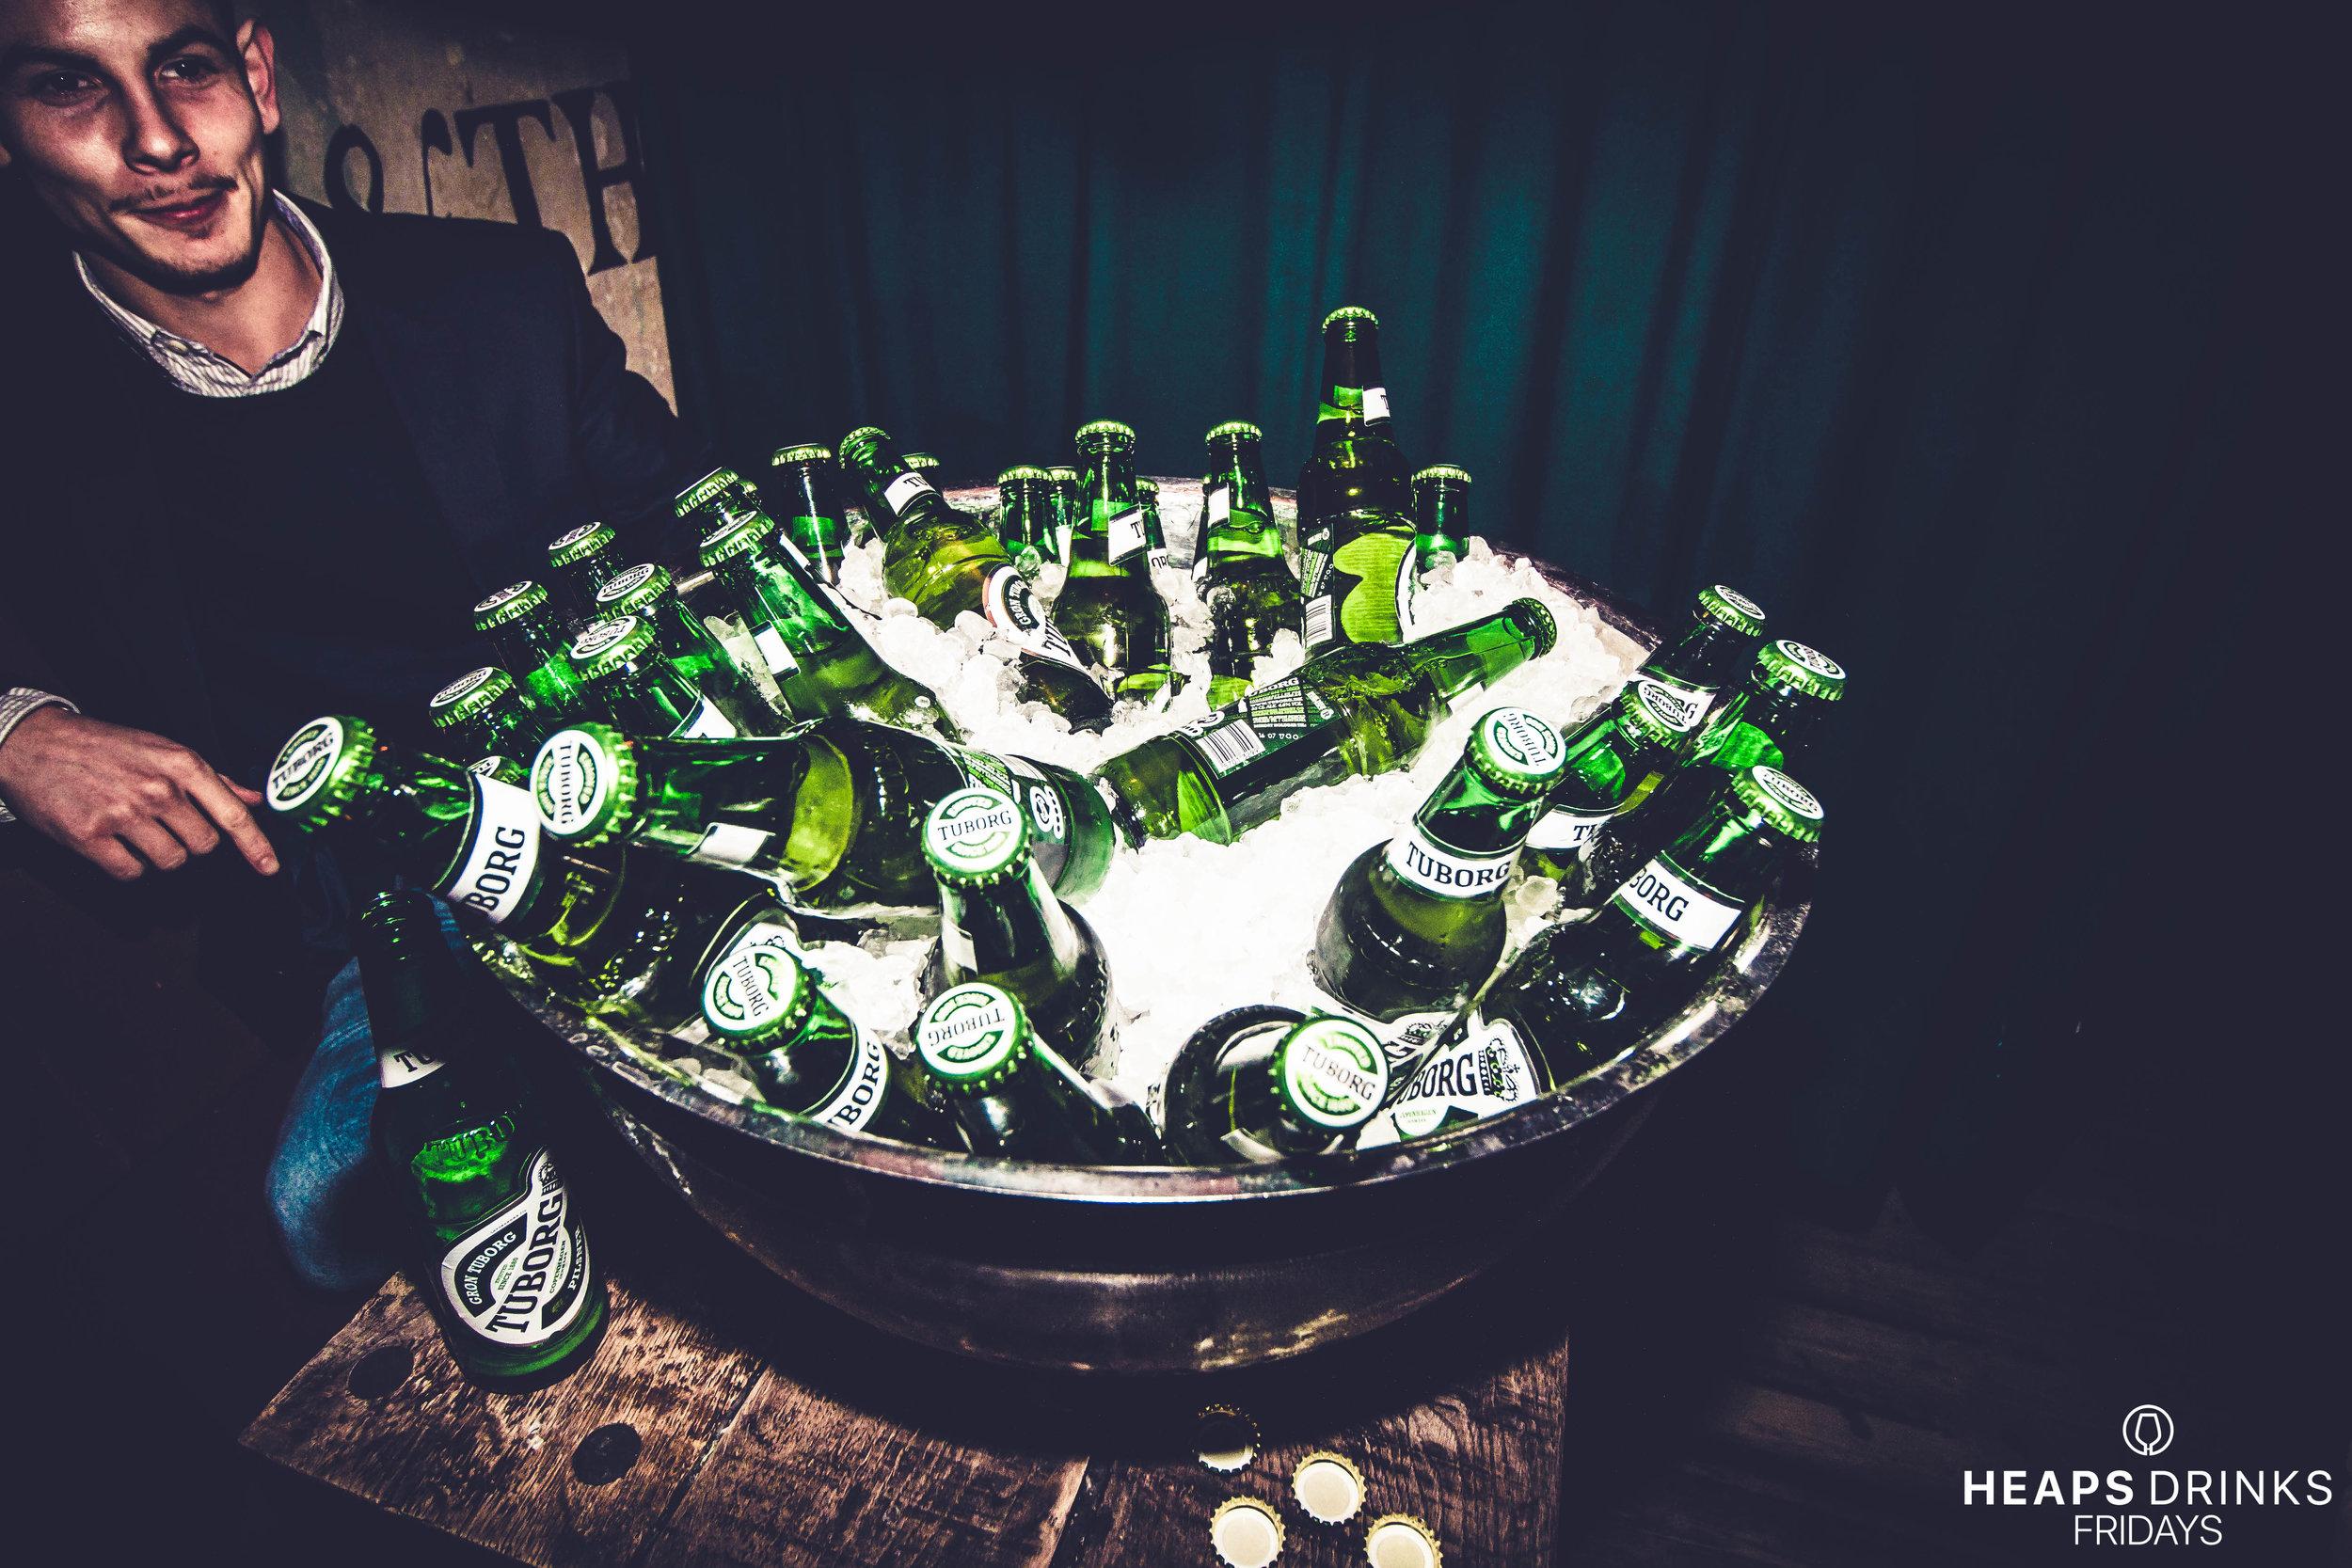 Heaps_drinks_63.jpg